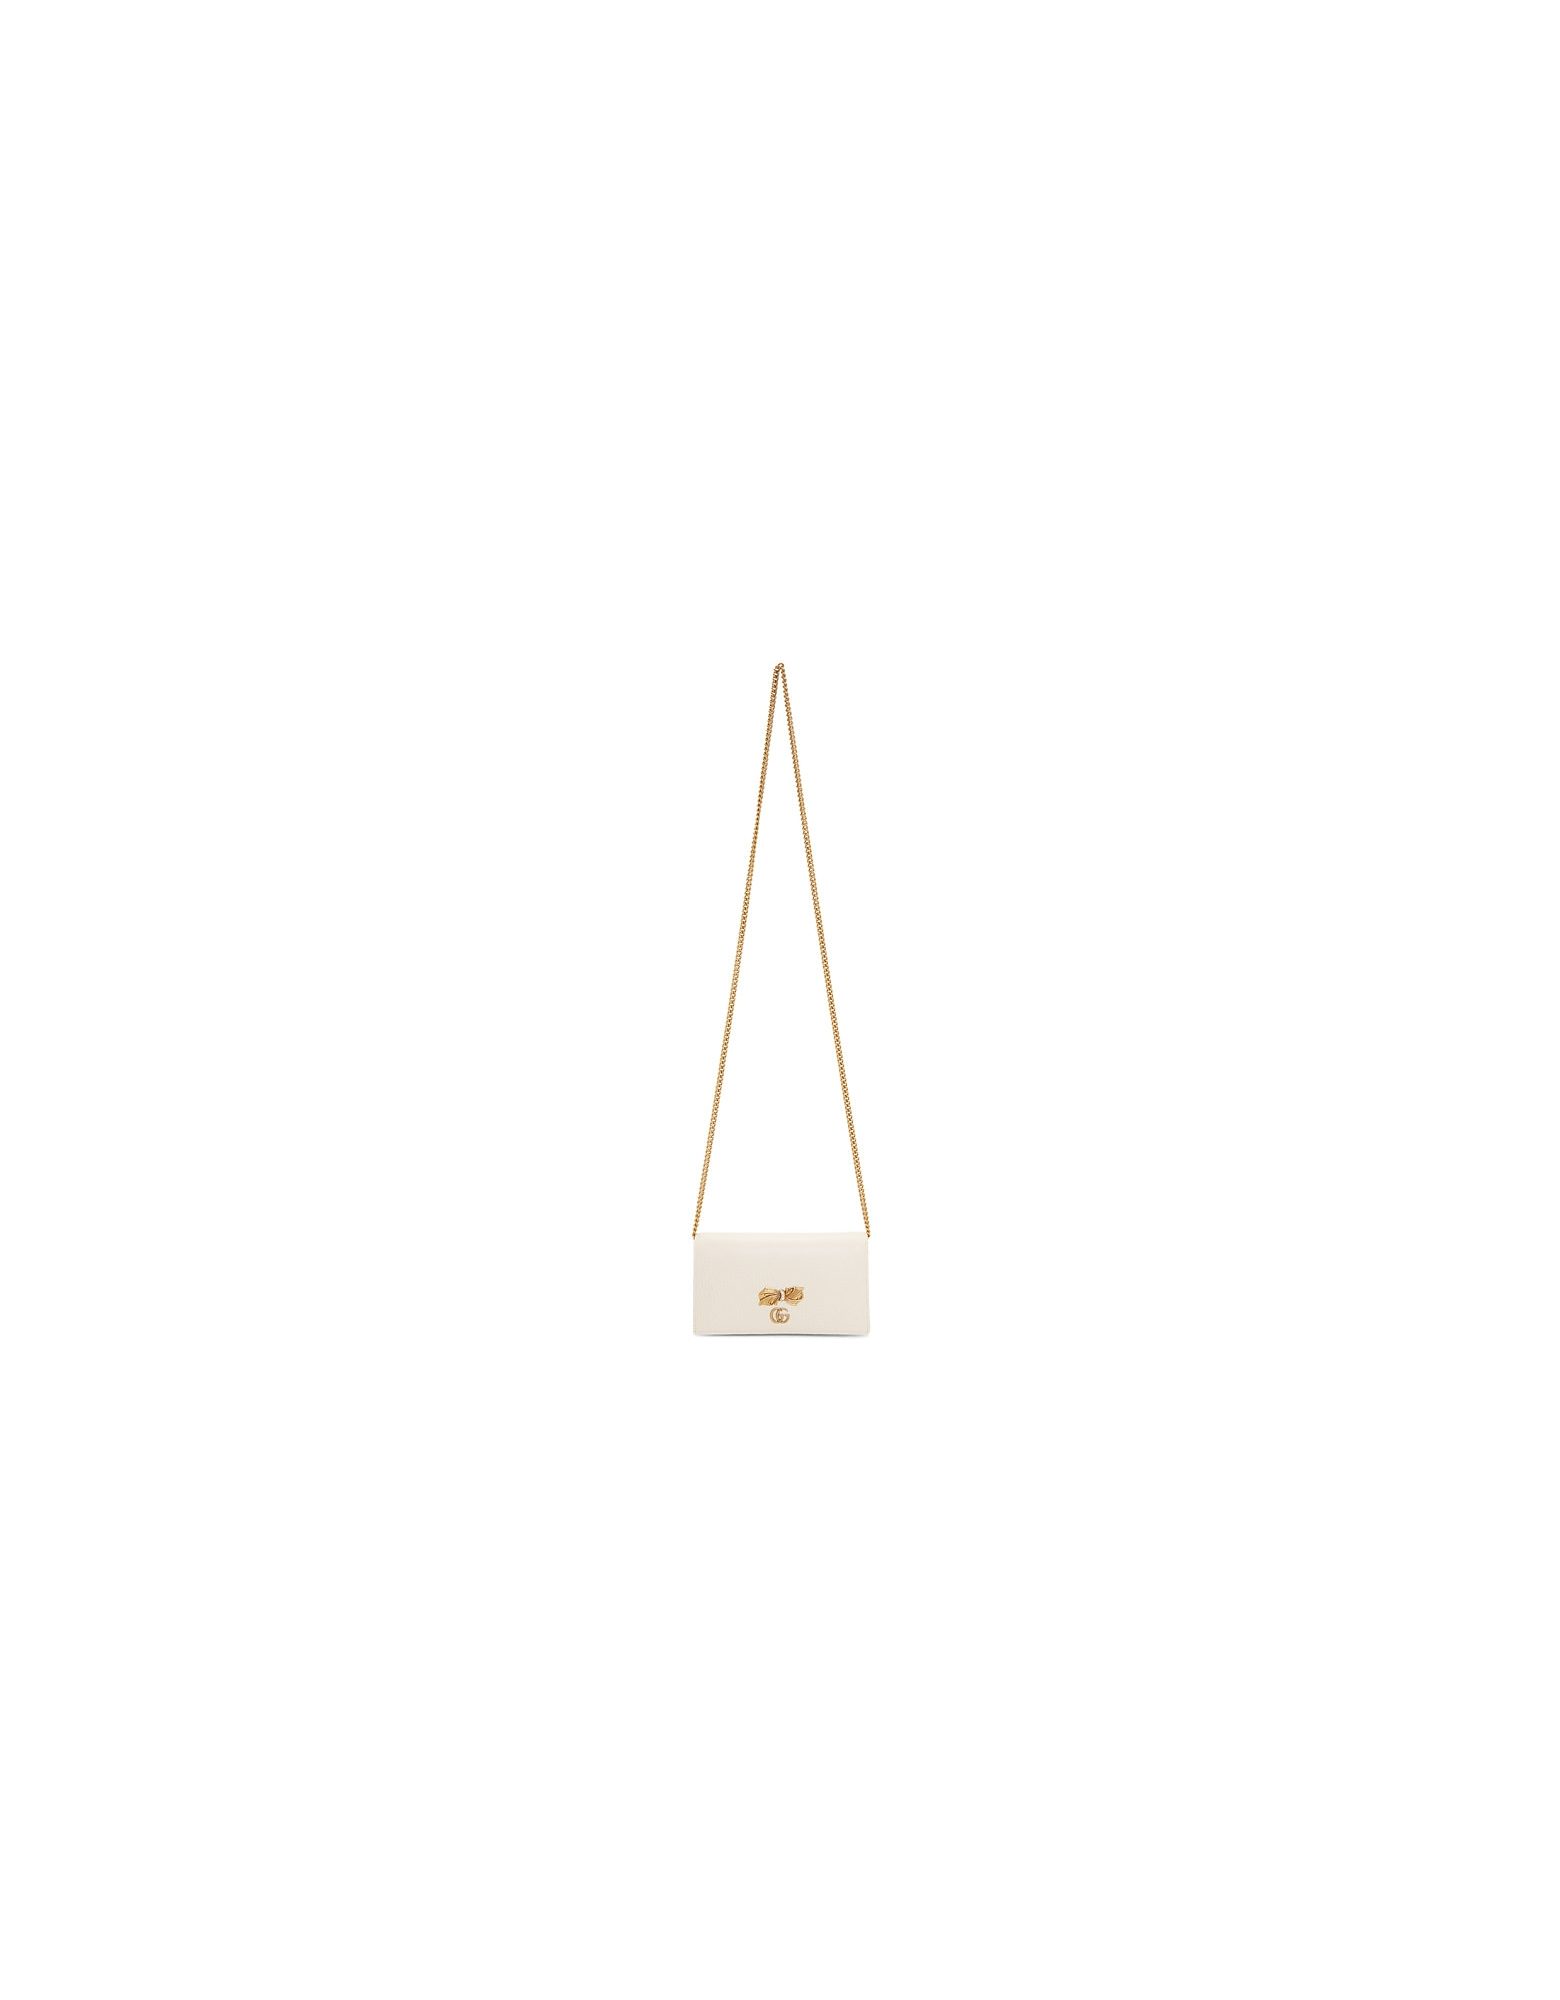 Gucci Designer Handbags, Off-White Bow Chain Wallet Bag